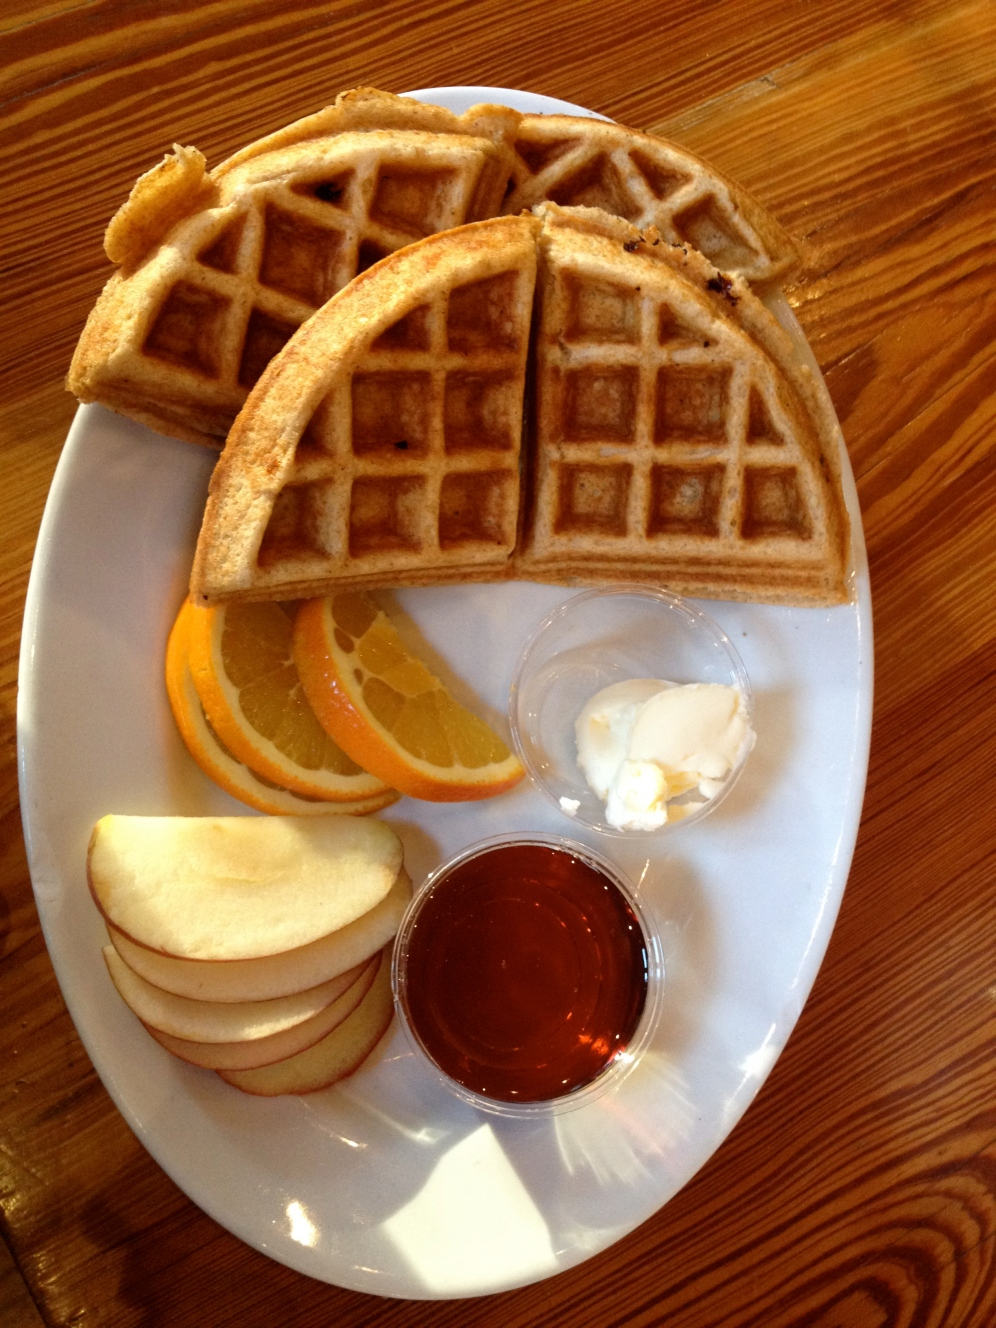 Whole Wheat Pancakes The Urban Farmhouse and Market, Richmond, VA (c) Winter Shanck, 2013